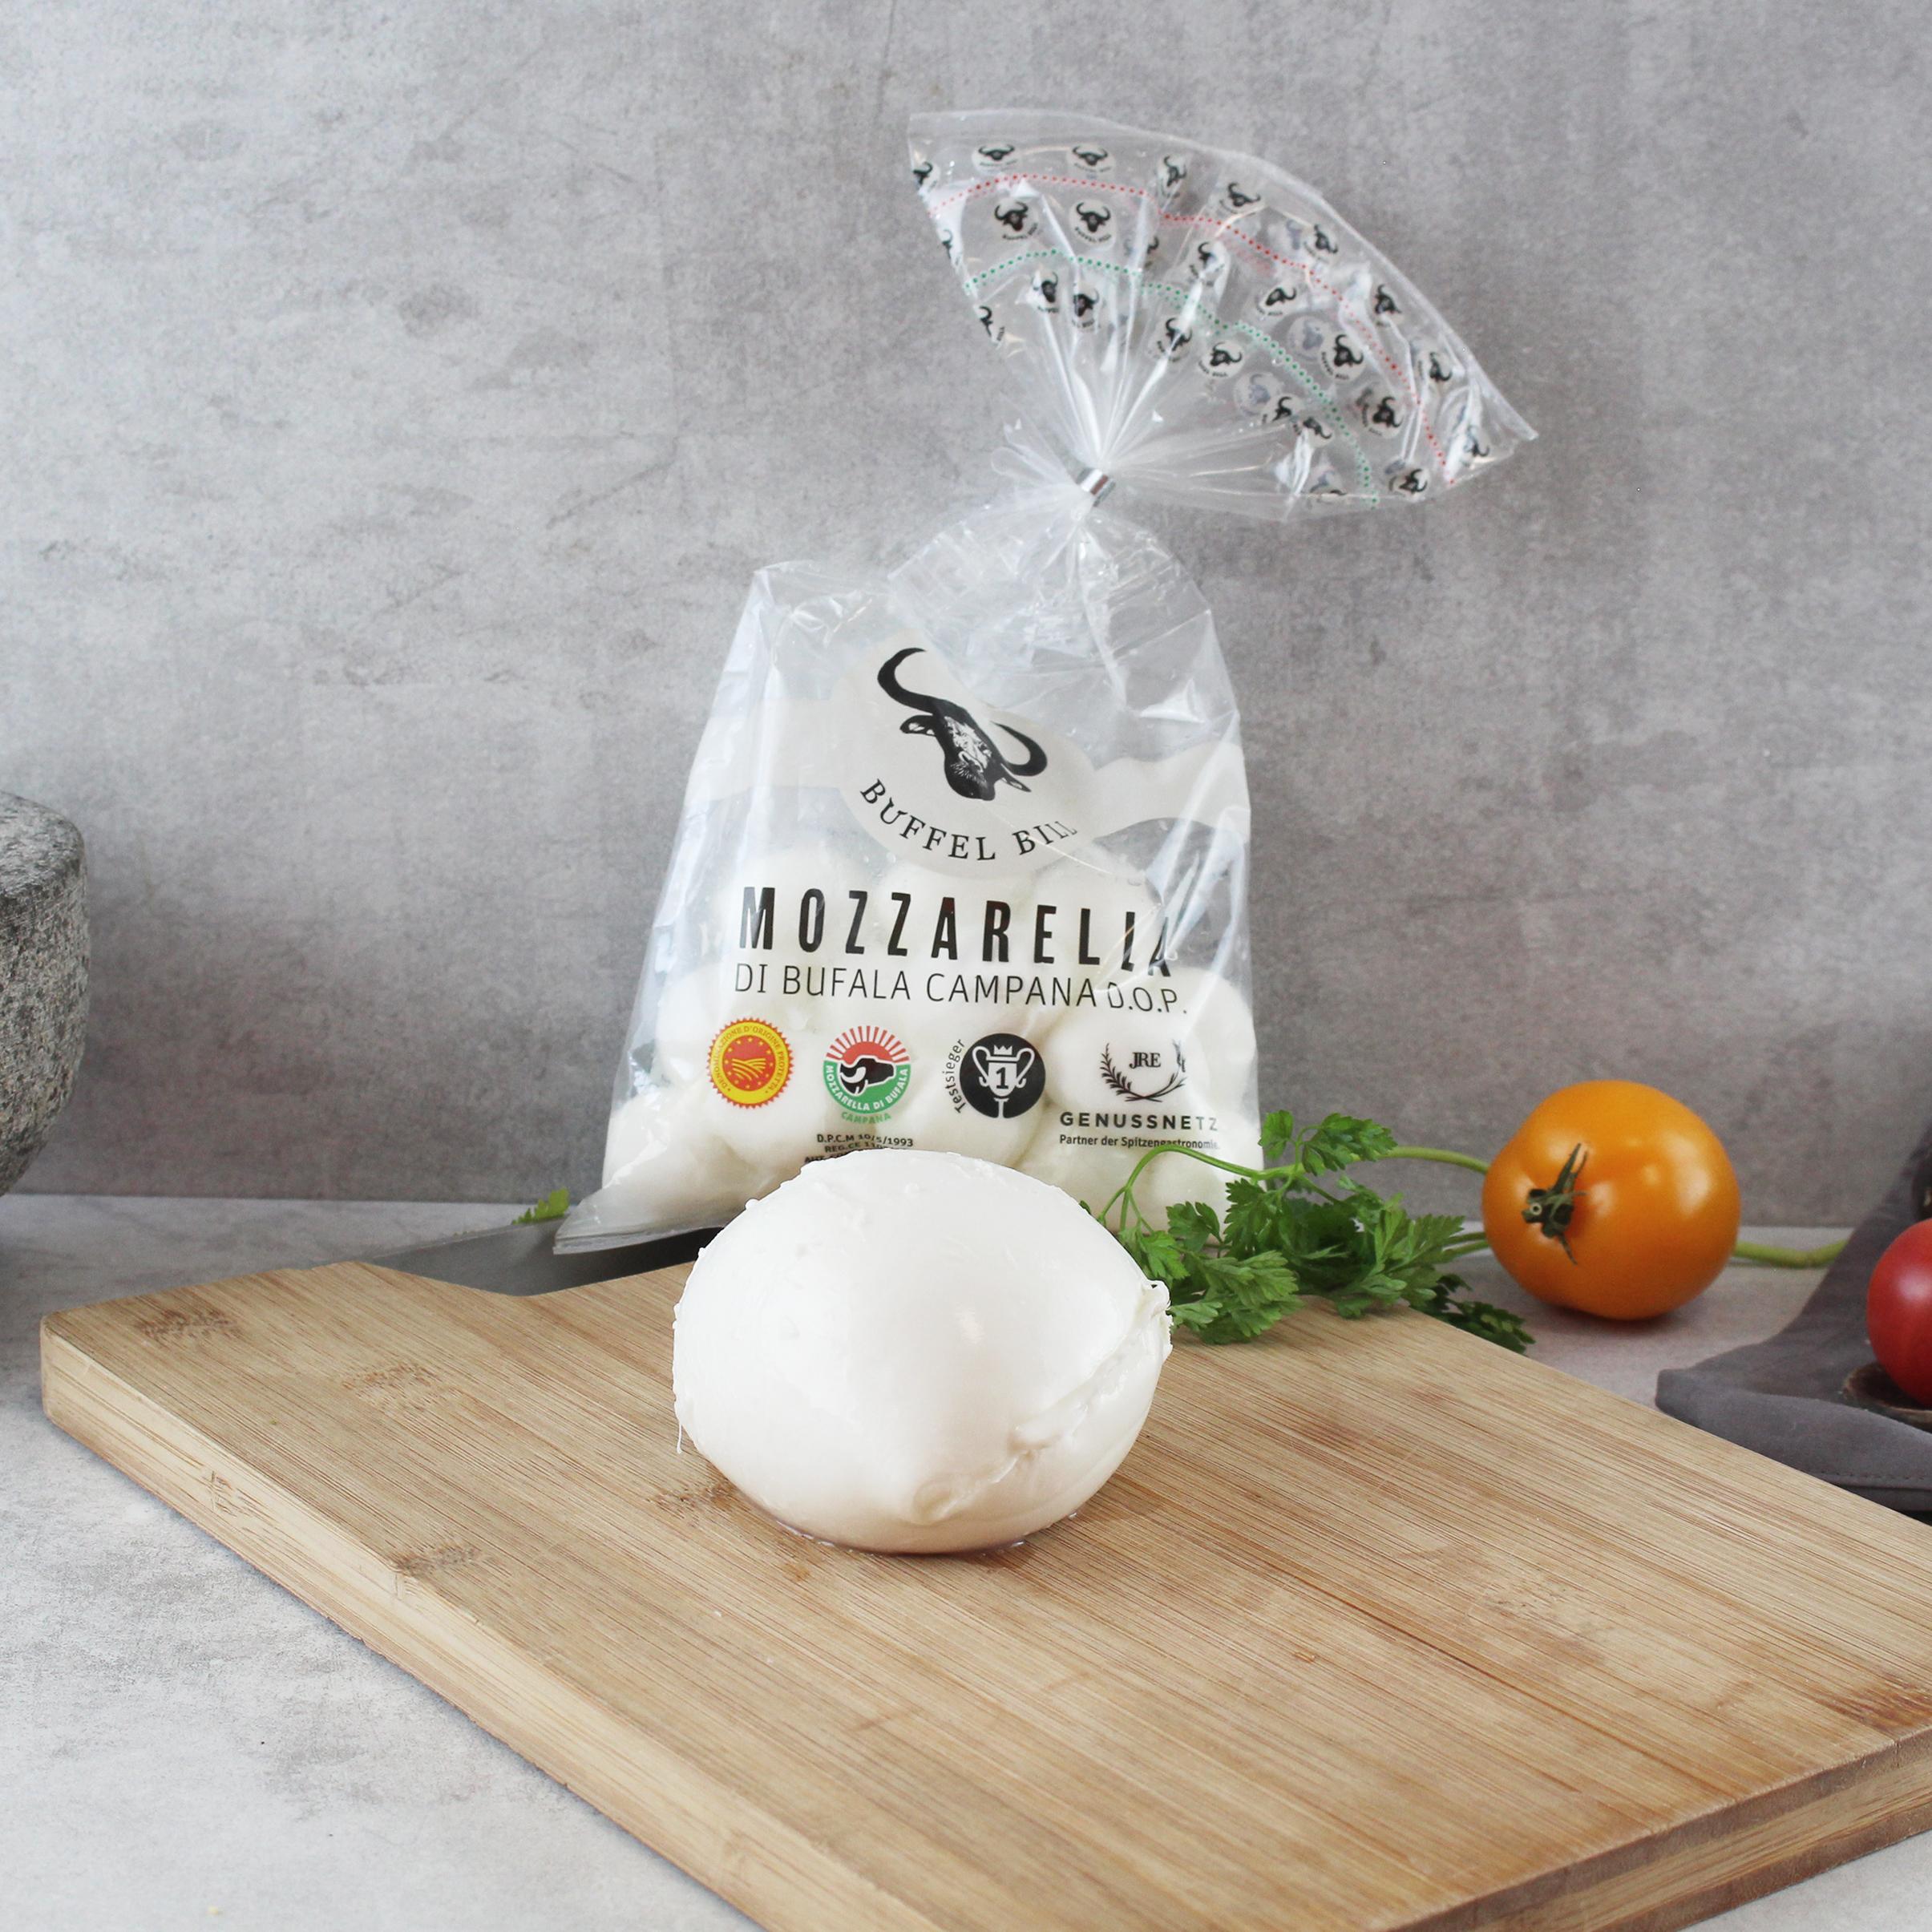 bb-mozzarella--di-bufala-campana-d.o.p.-250-g-kugel-1-kugel-packung-italien-markthalle20-1